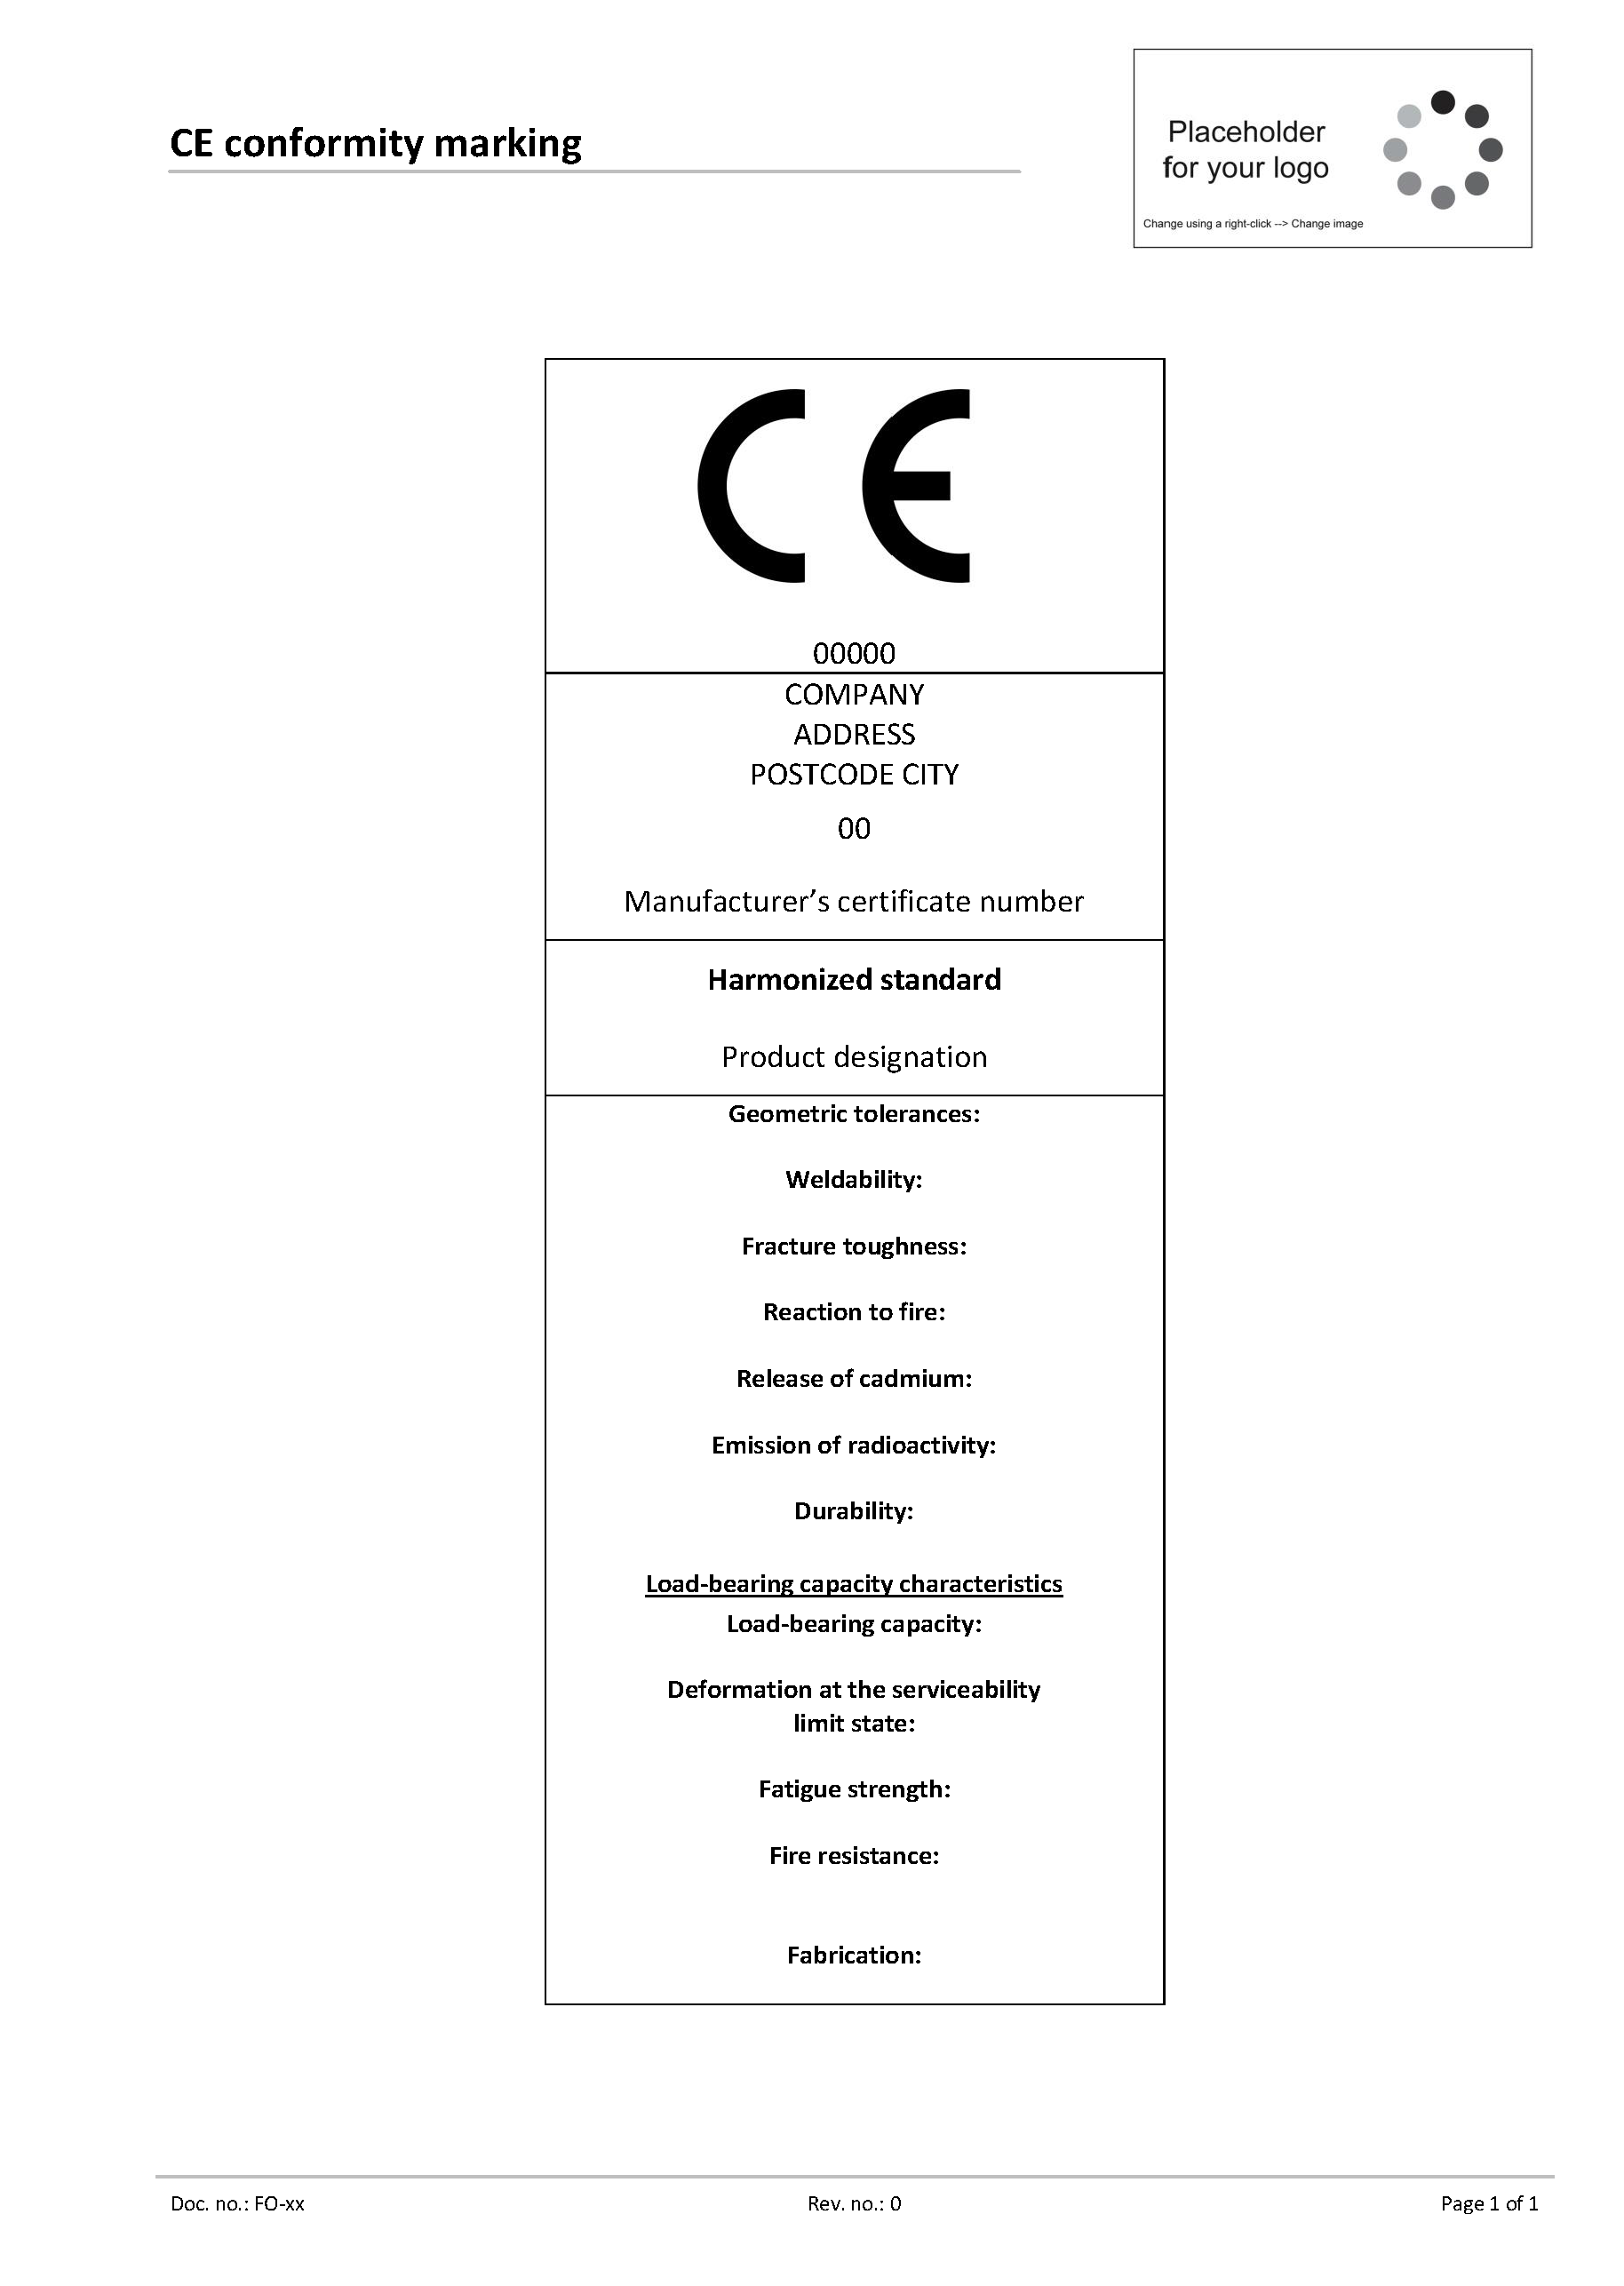 Formblatt En1090 Getworx Webshop Verlag Grafik Und Ingenieurburo